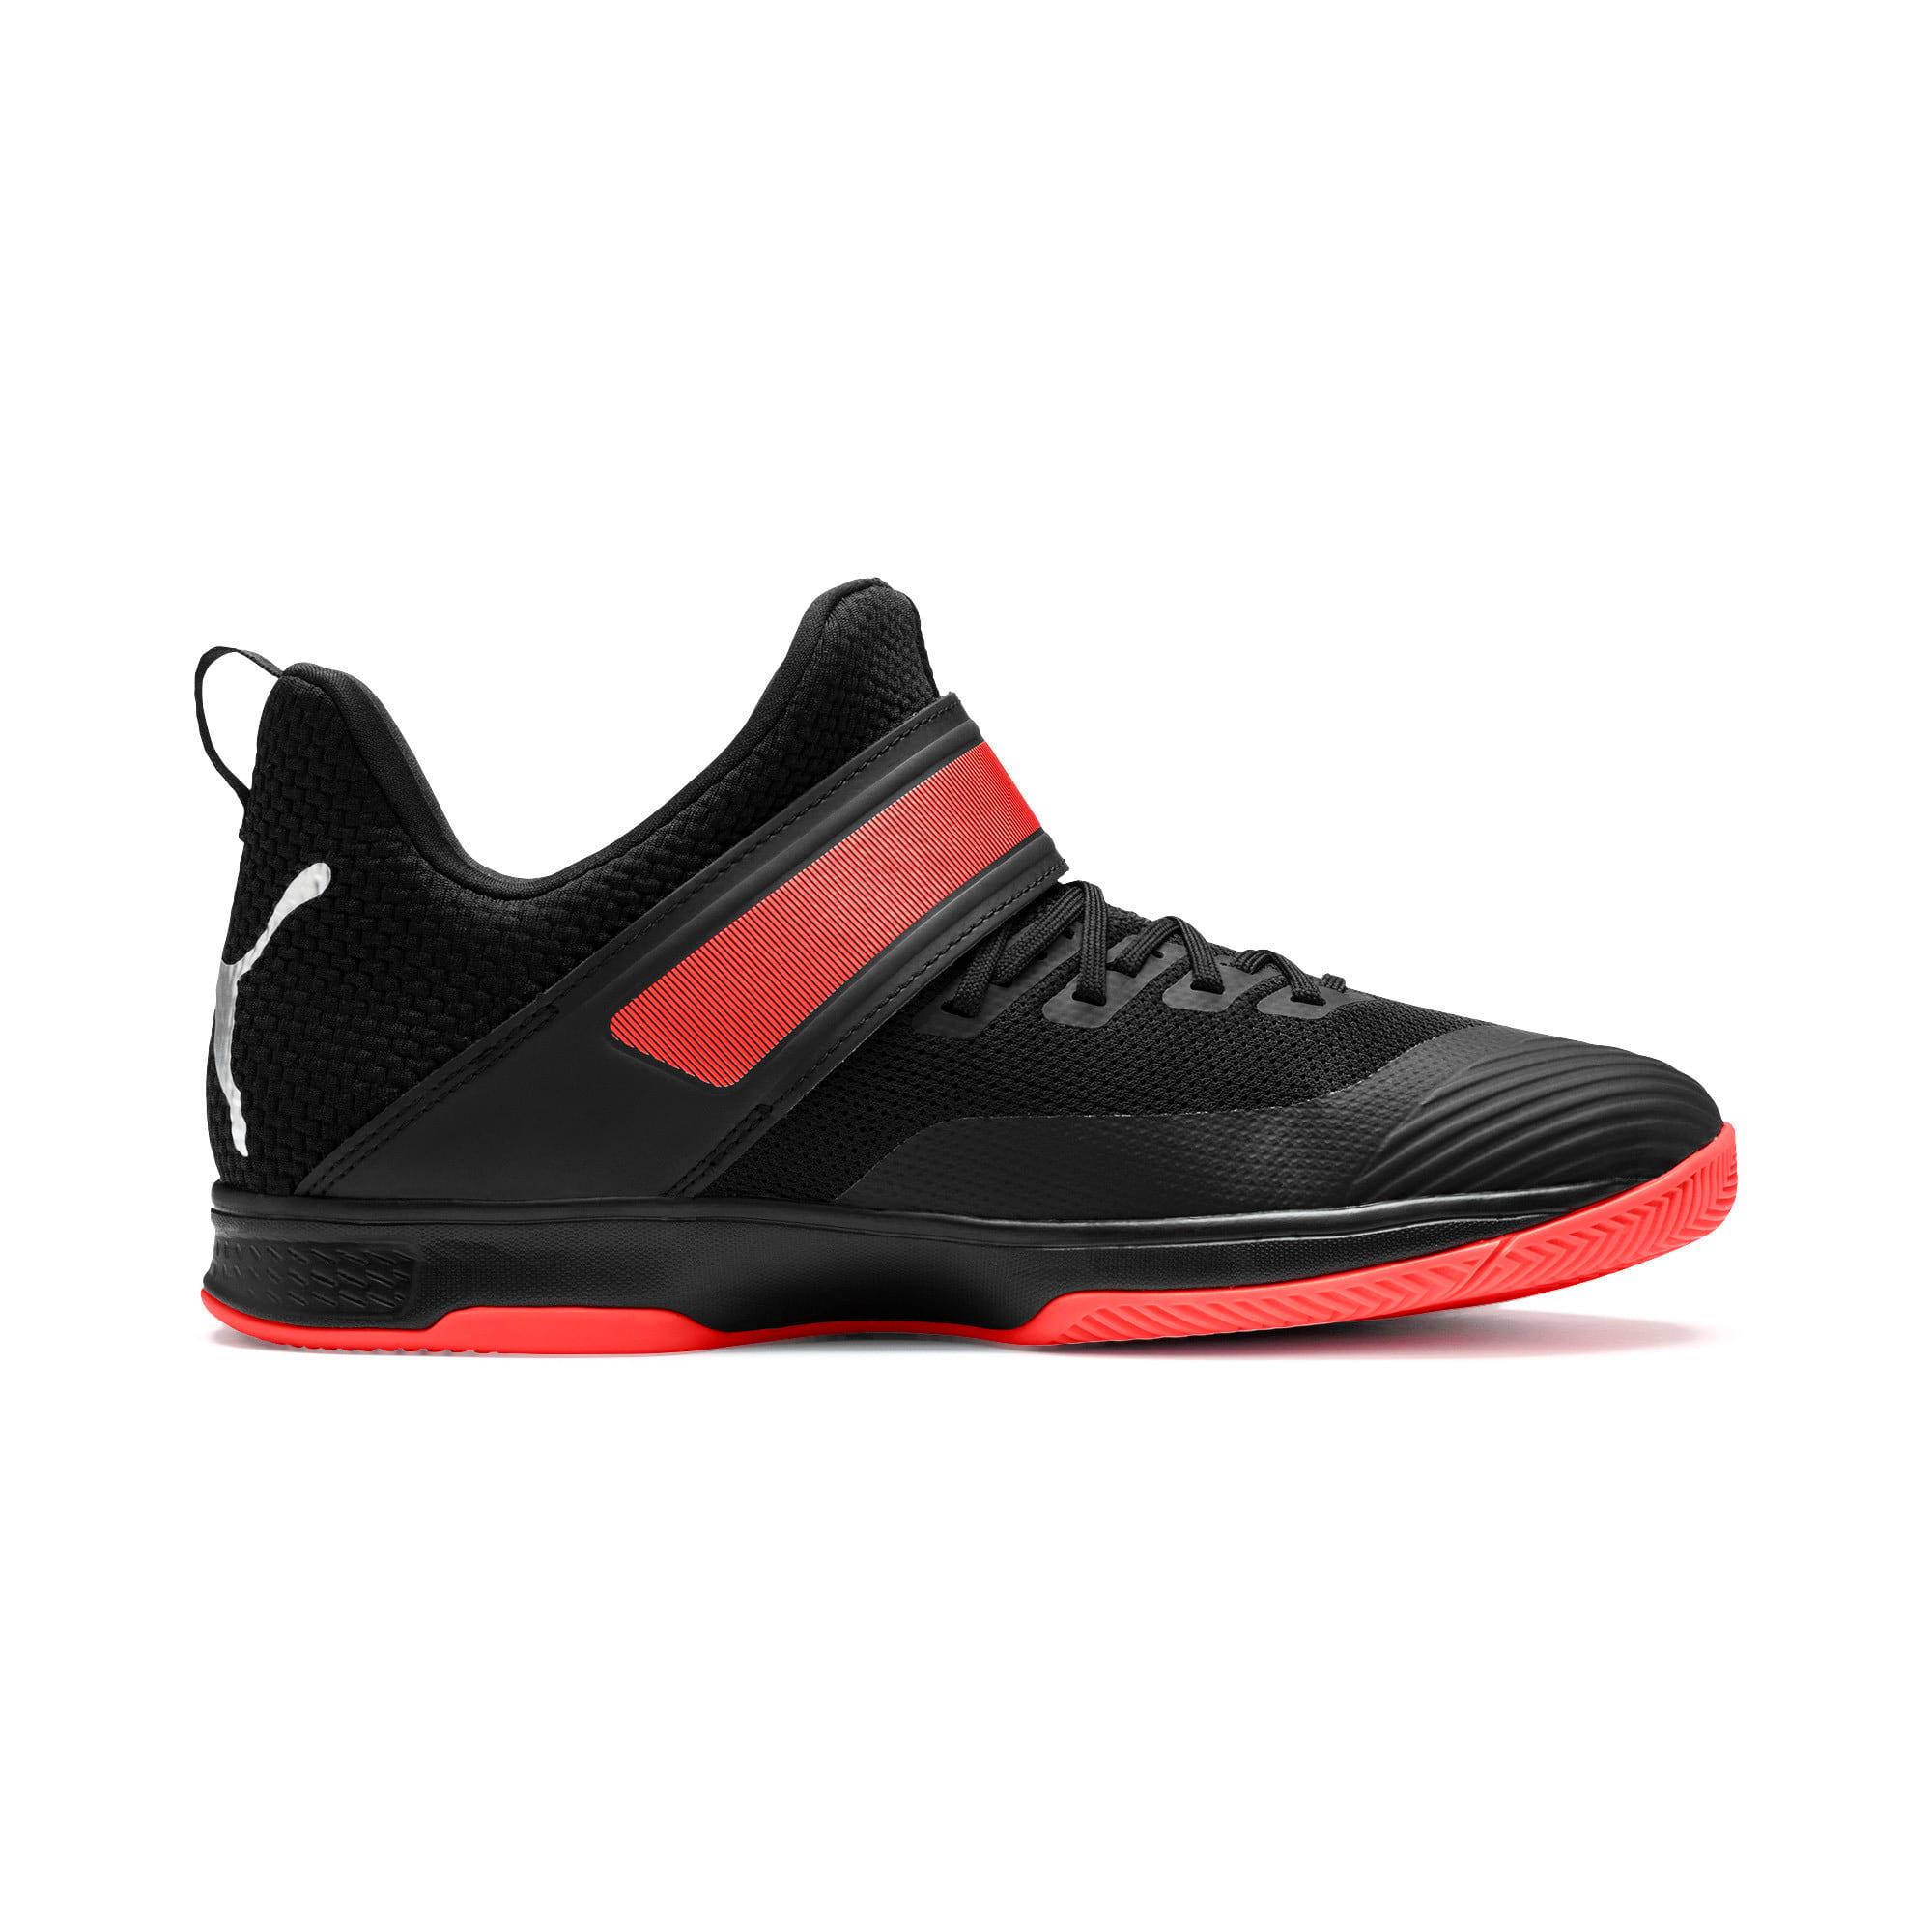 Thumbnail 6 of Chaussures Handball Rise XT3, Puma Black-Silver-Nrgy Red, medium